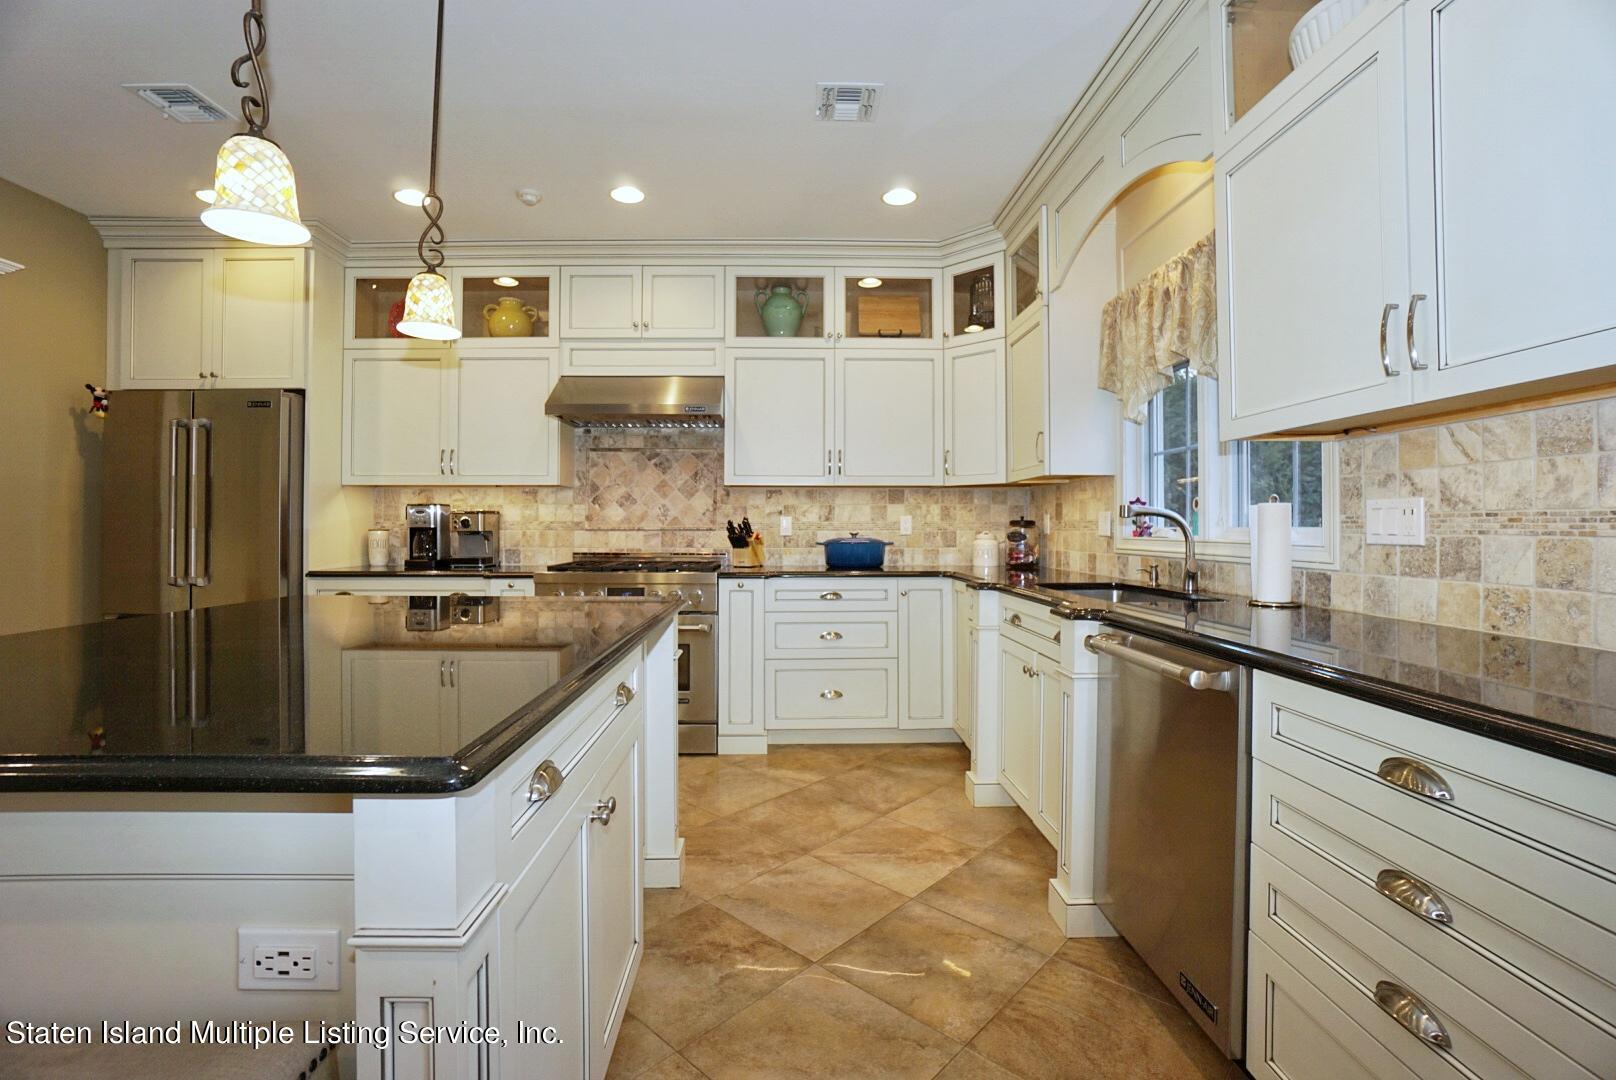 Single Family - Detached 31 Belwood Loop  Staten Island, NY 10307, MLS-1143133-24